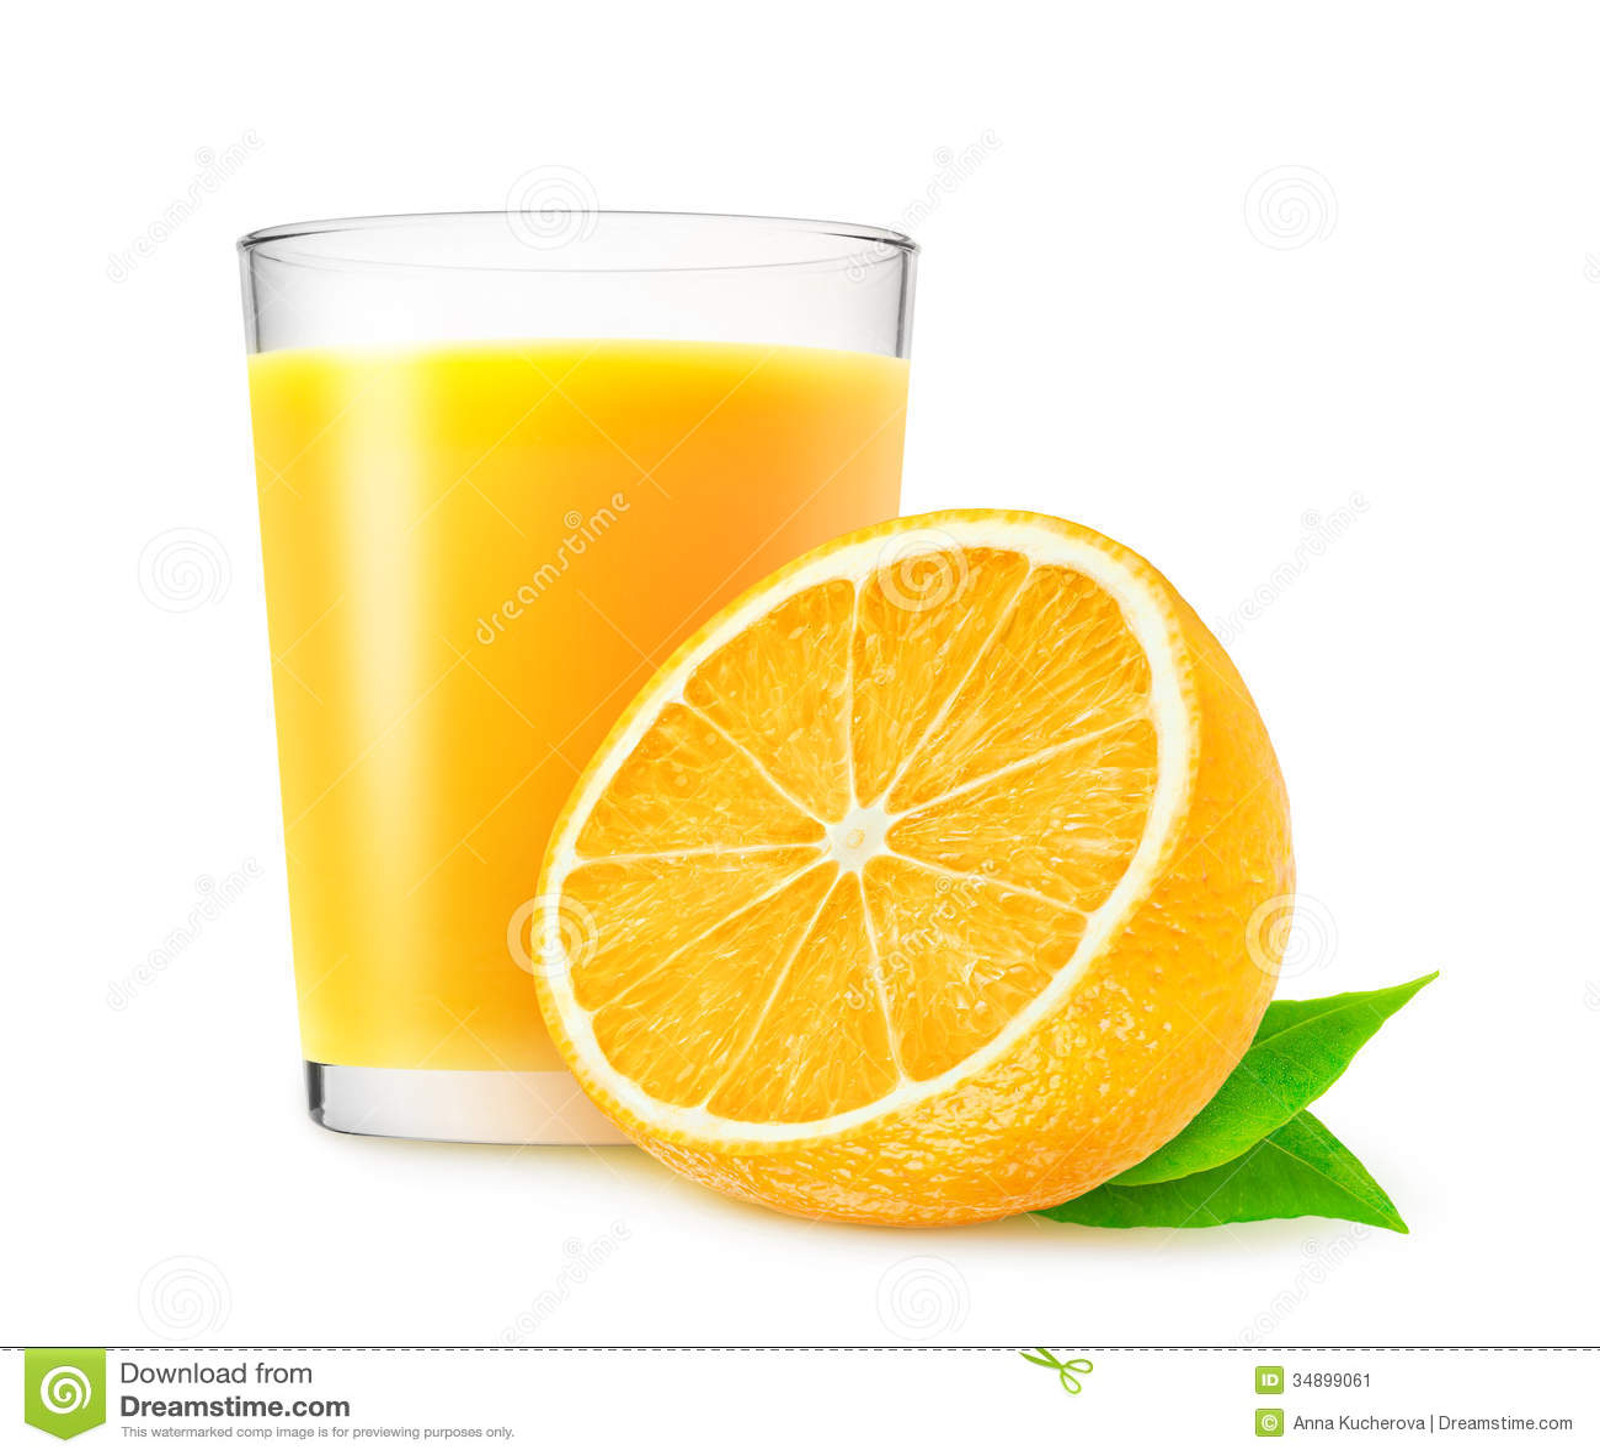 orange juice stock image image of leaves bright delicious 34899061